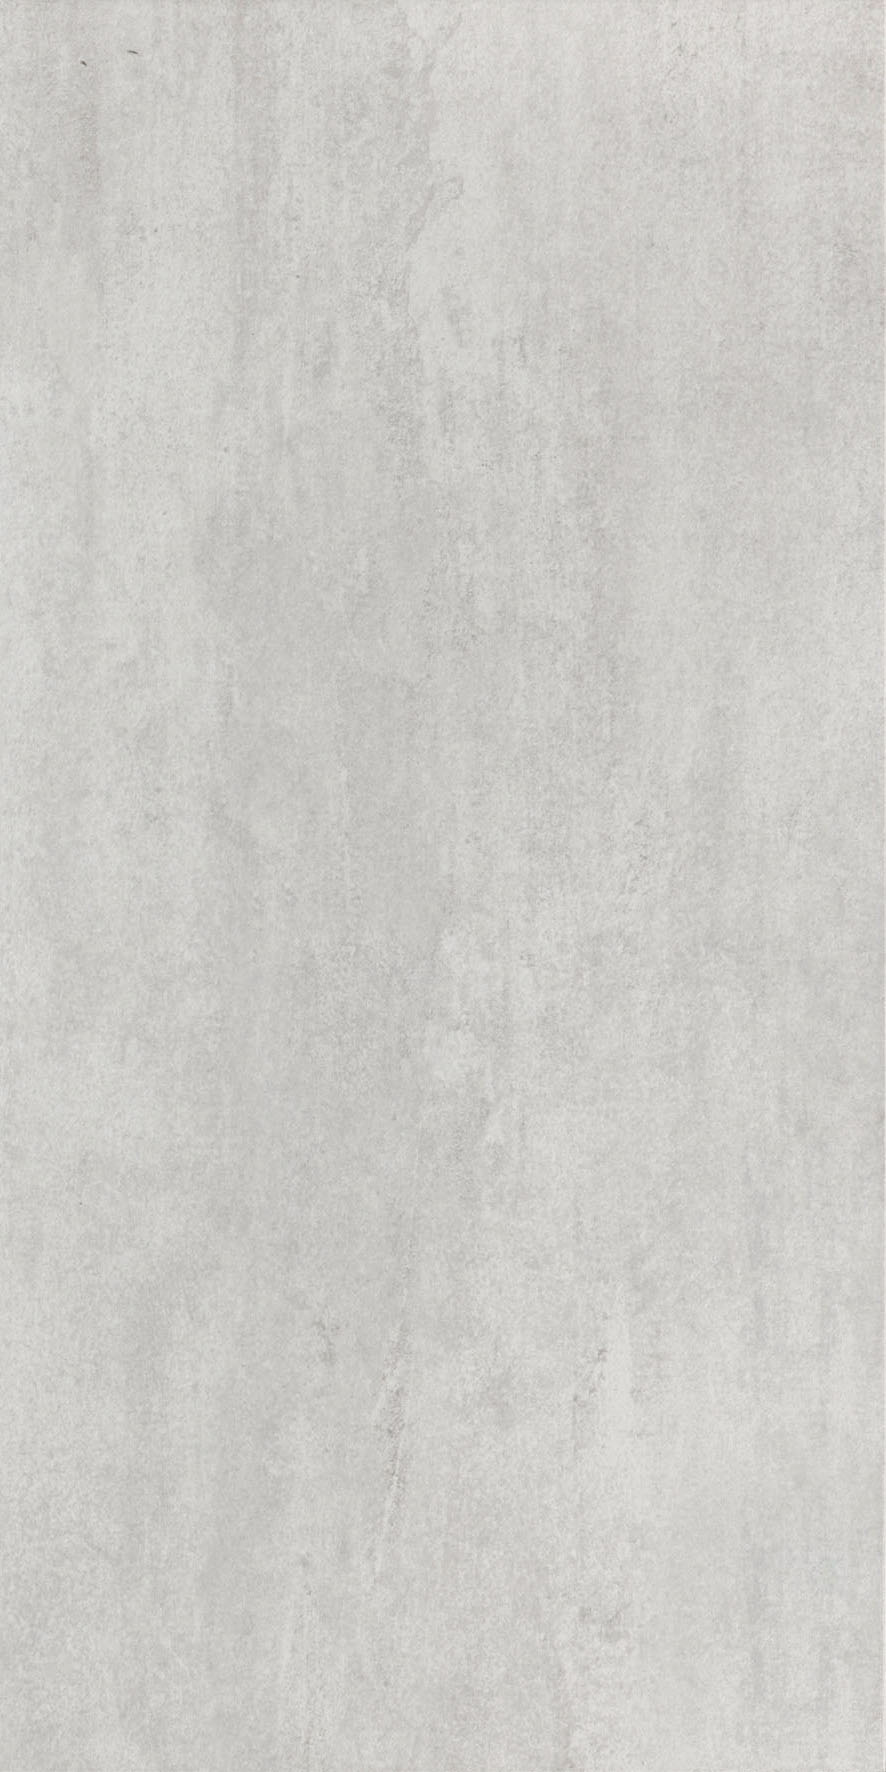 30x60,4 Elementi Bianco